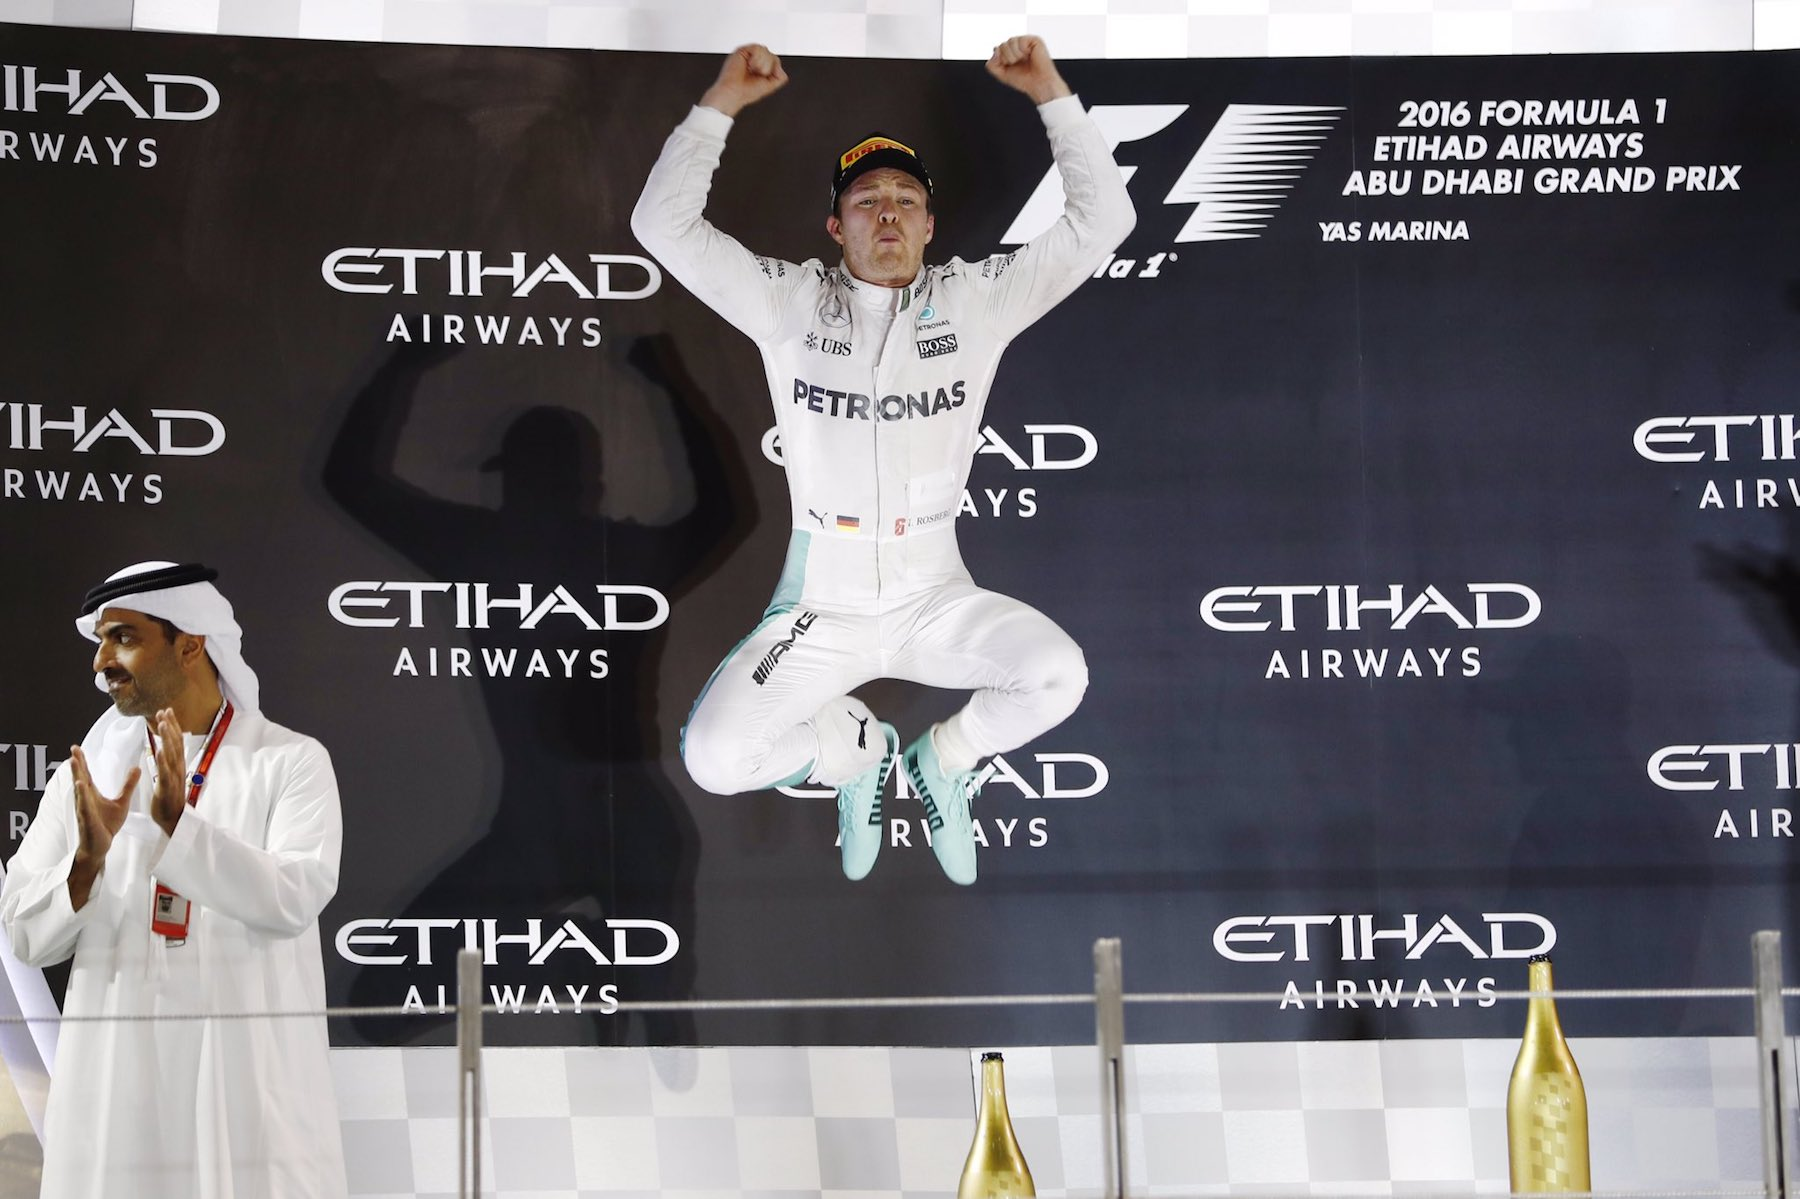 Salracing - Nico Rosberg after winning the 2016 WDC